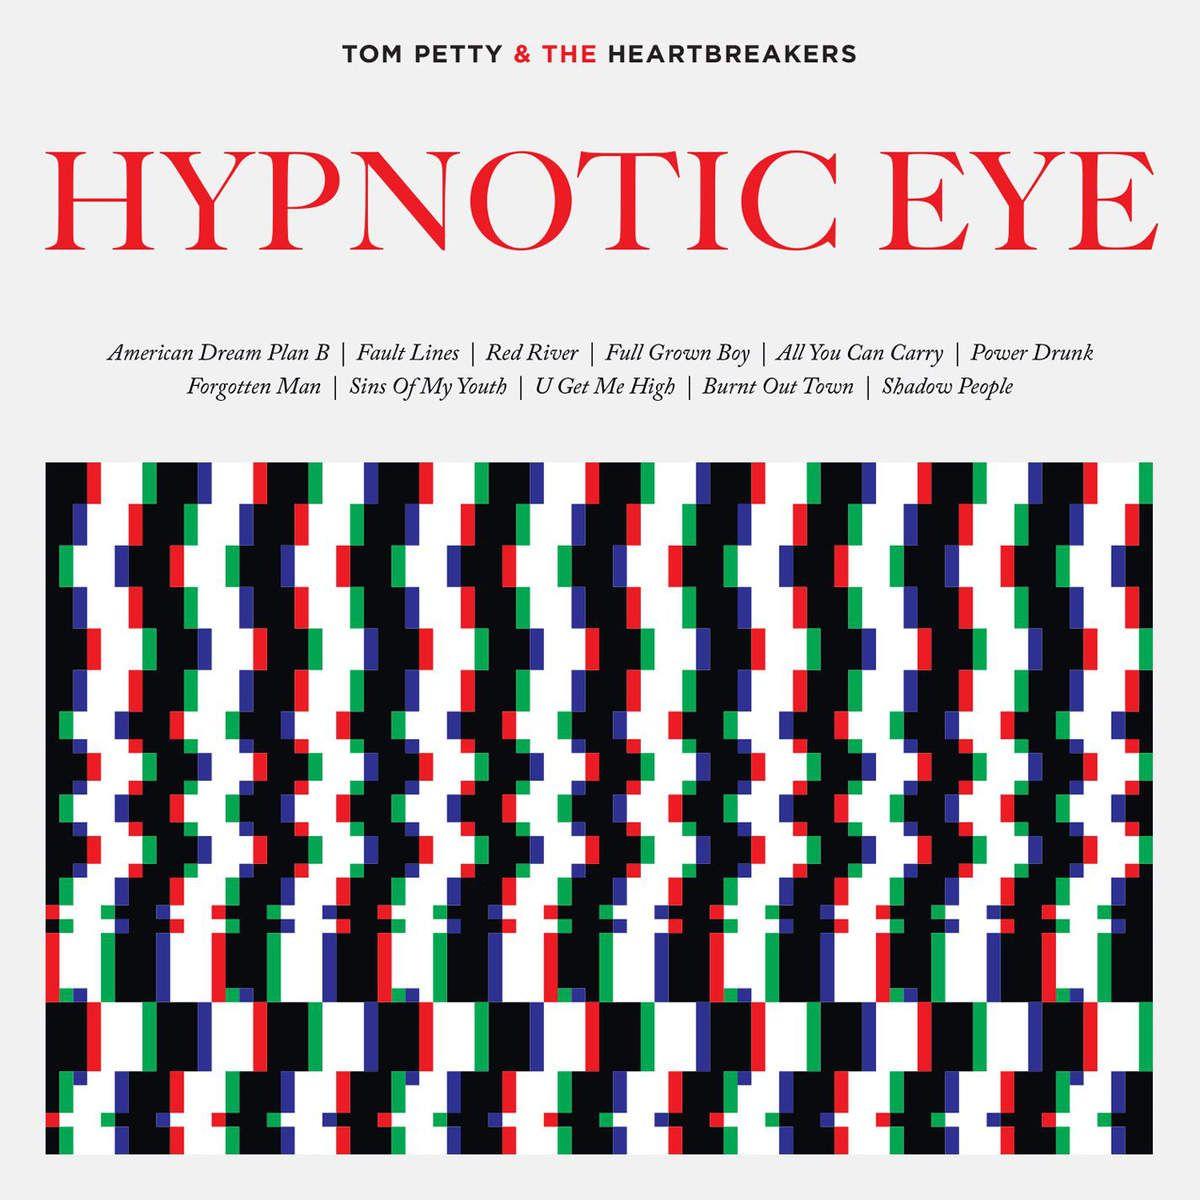 Tom Petty - Hypnotic Eye album cover